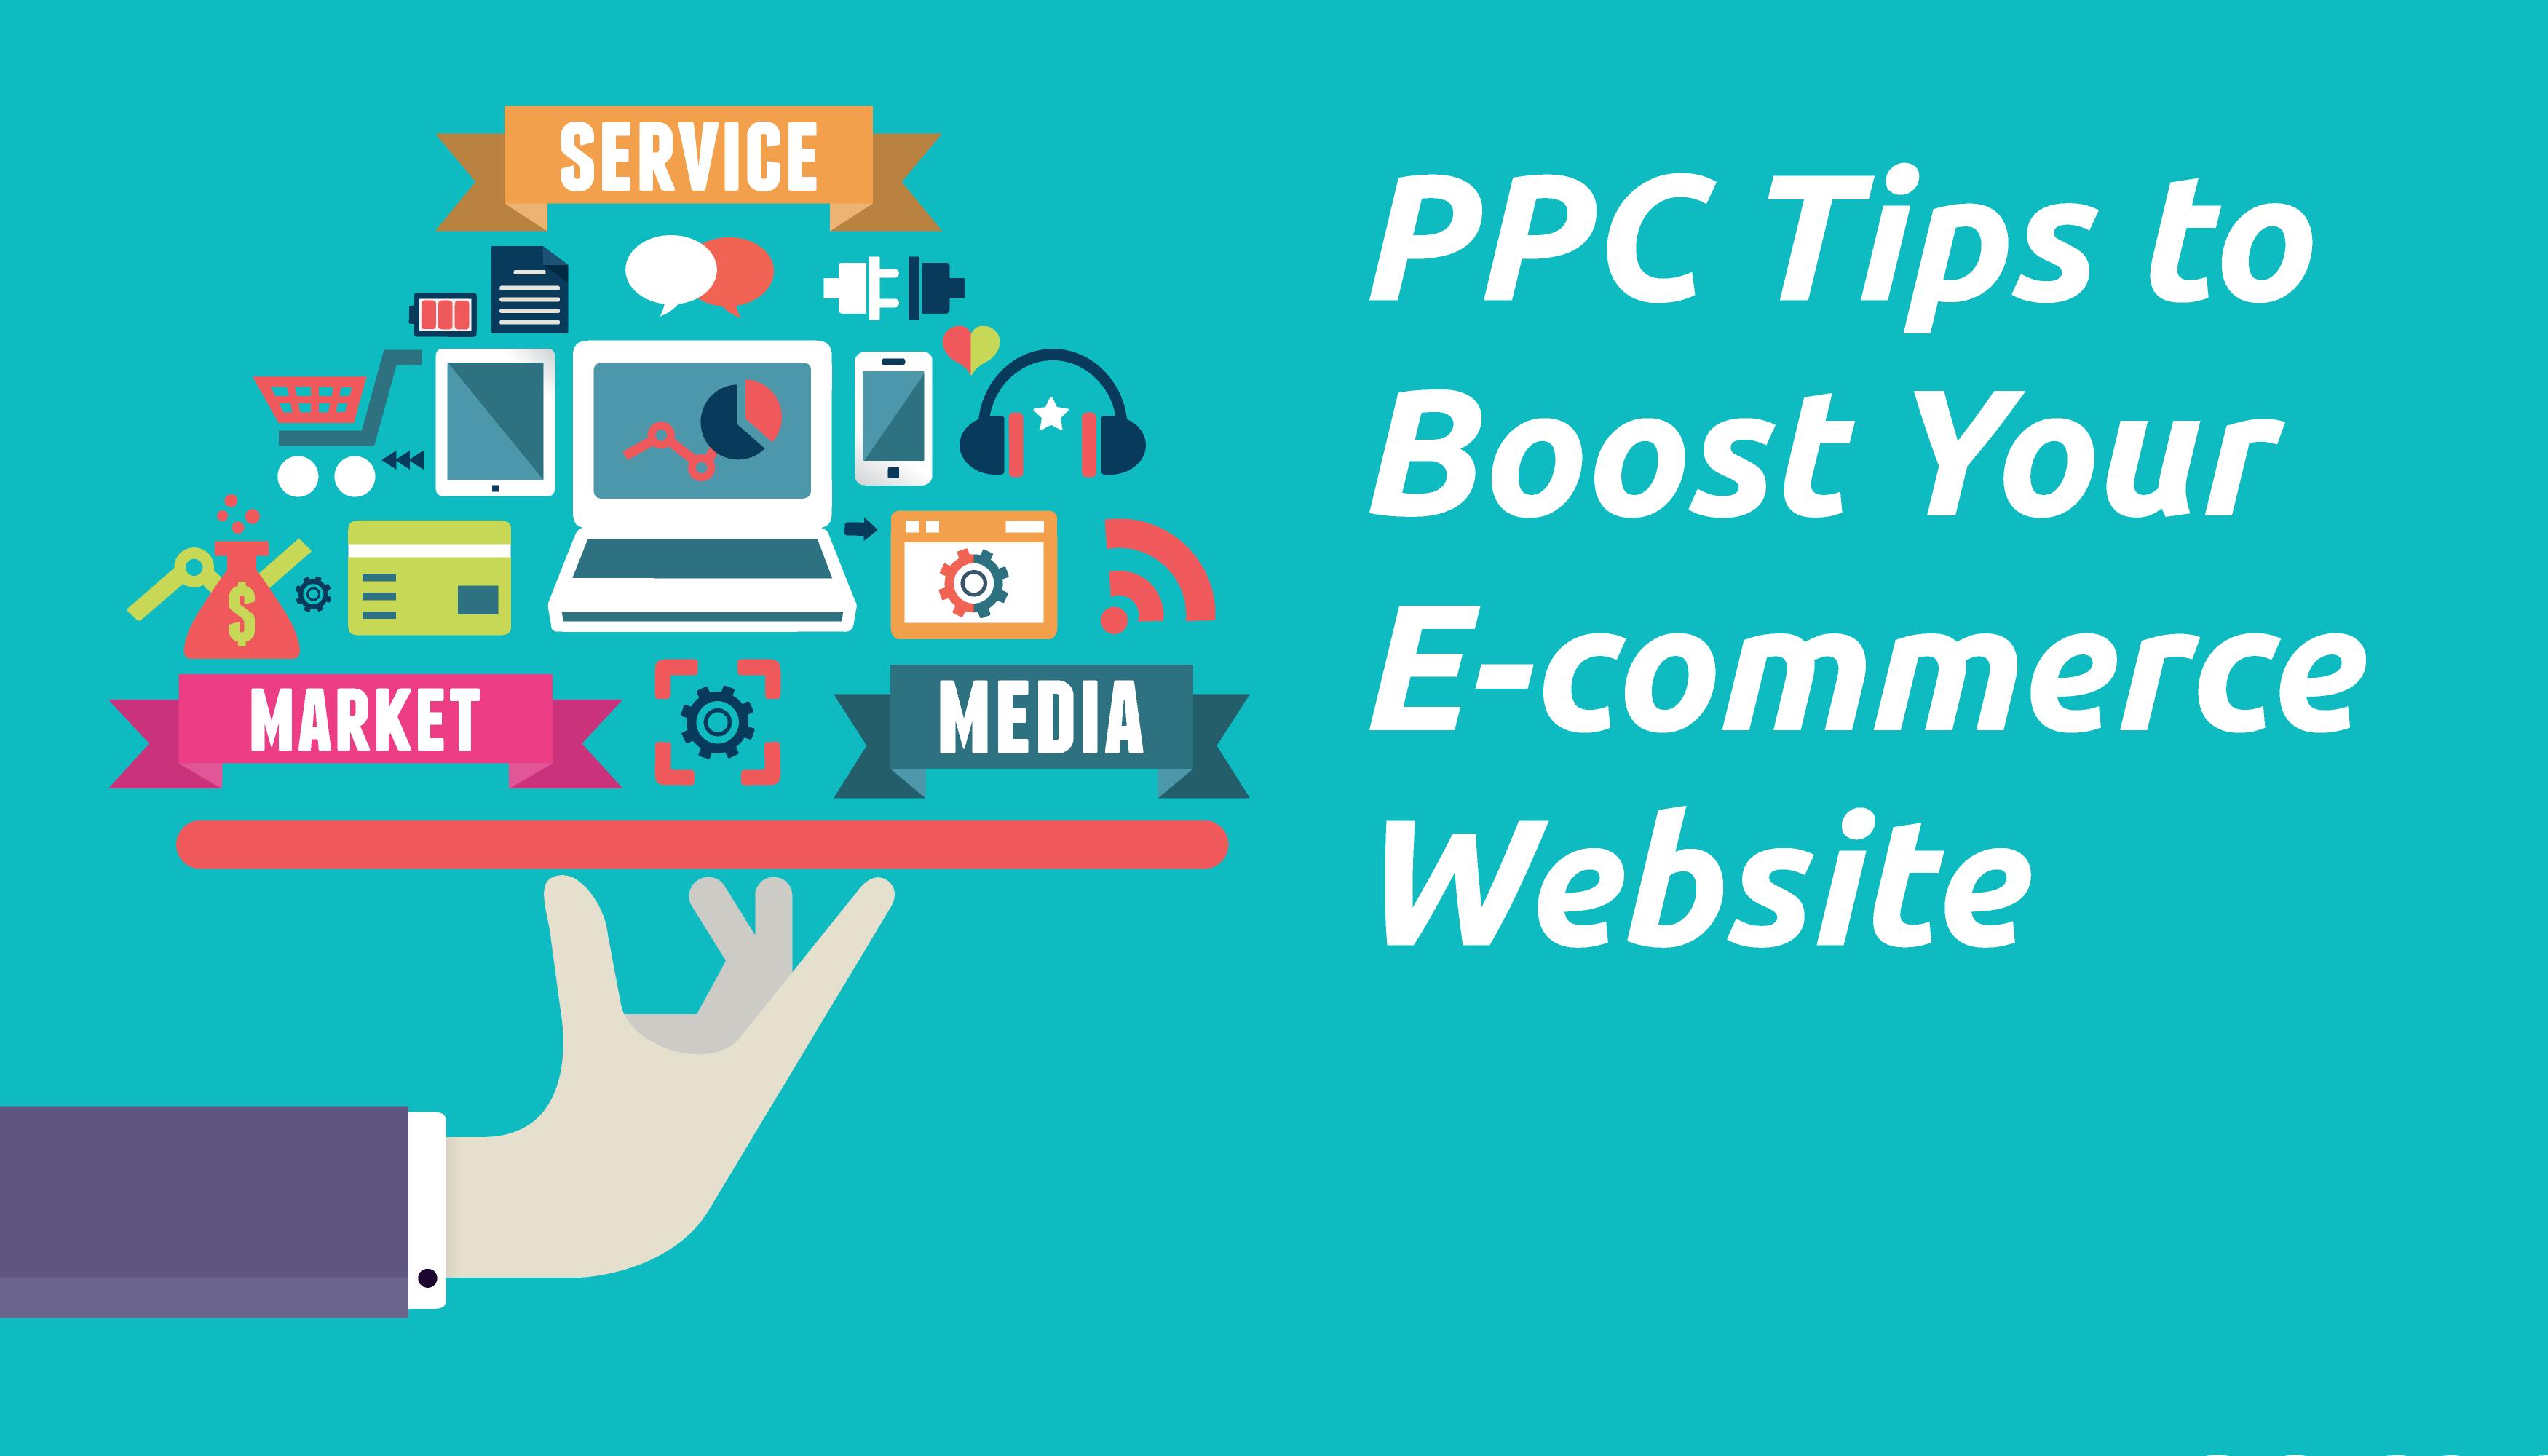 e-Commerce PPC Tips